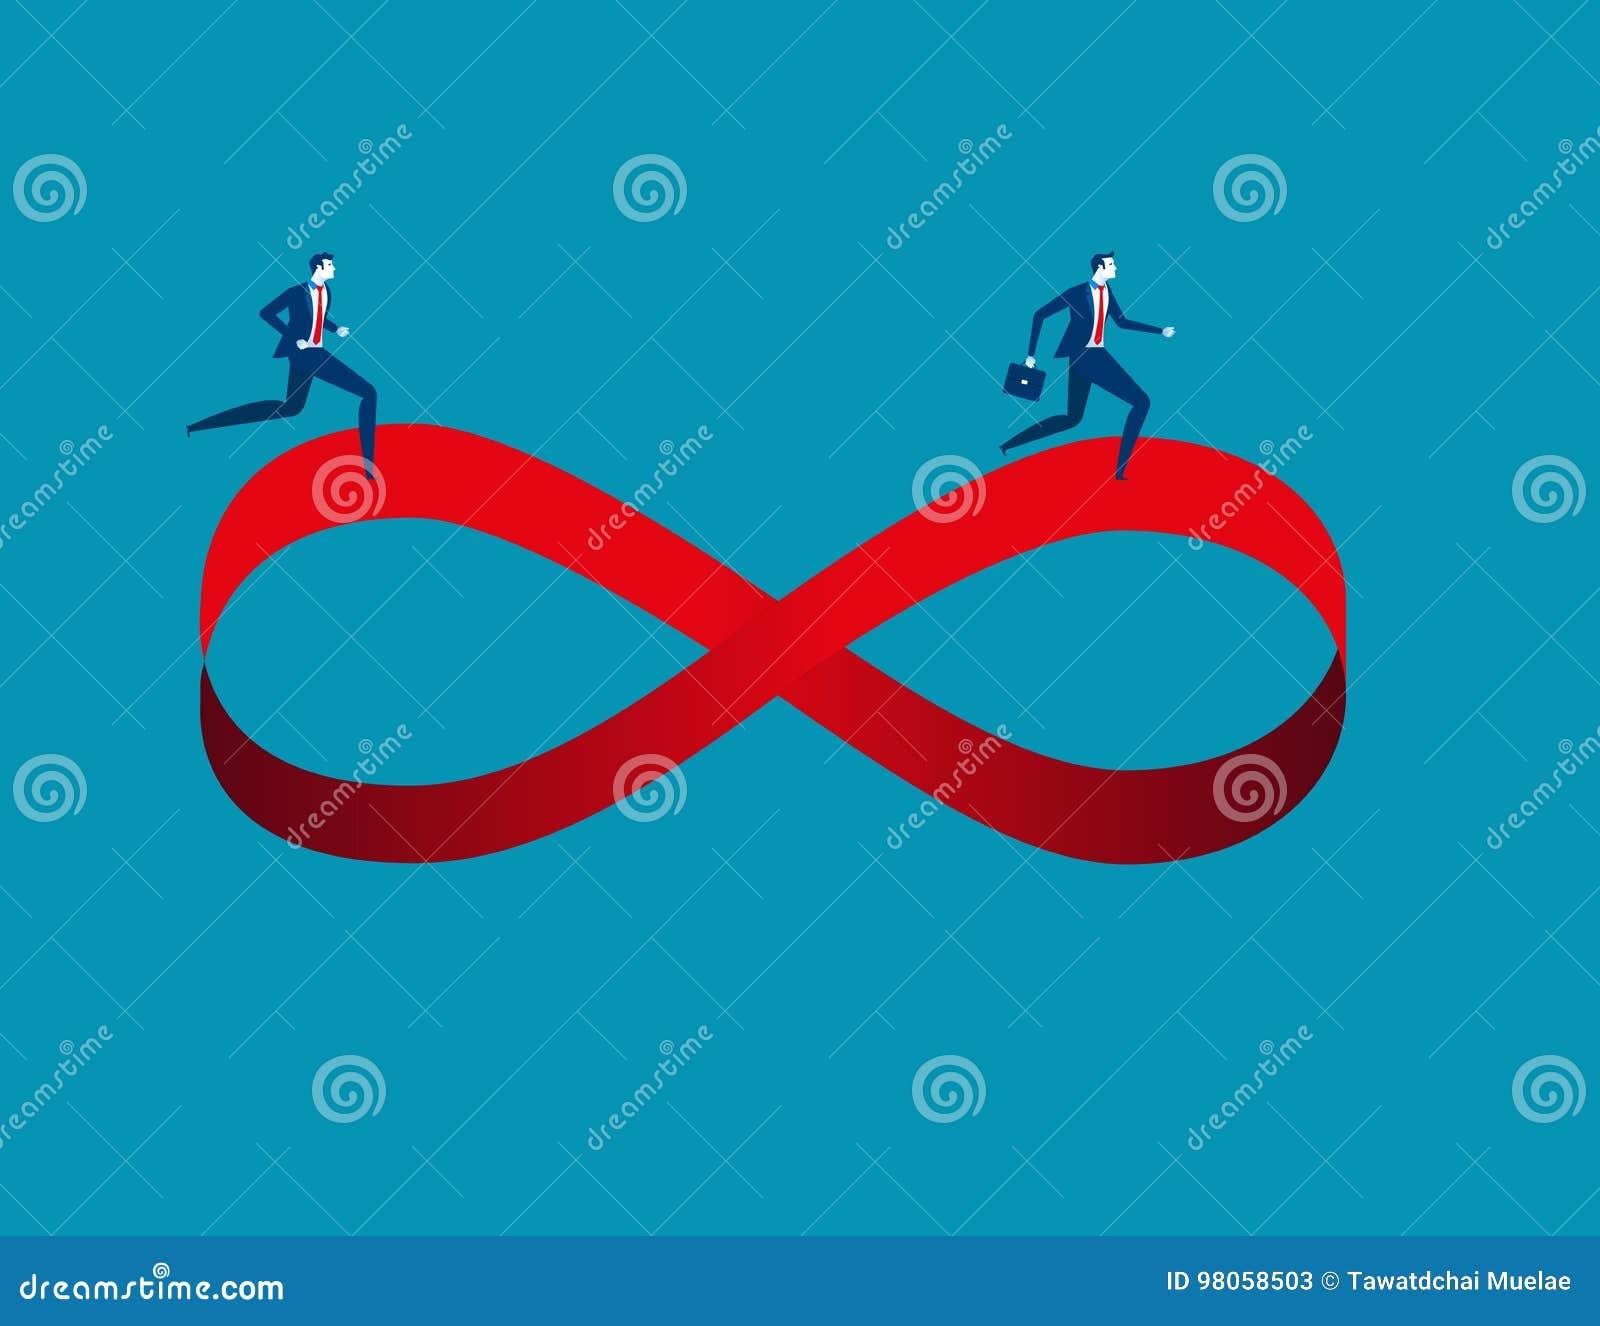 Businessmen Running On Infinity Symbol Concept Business Image I